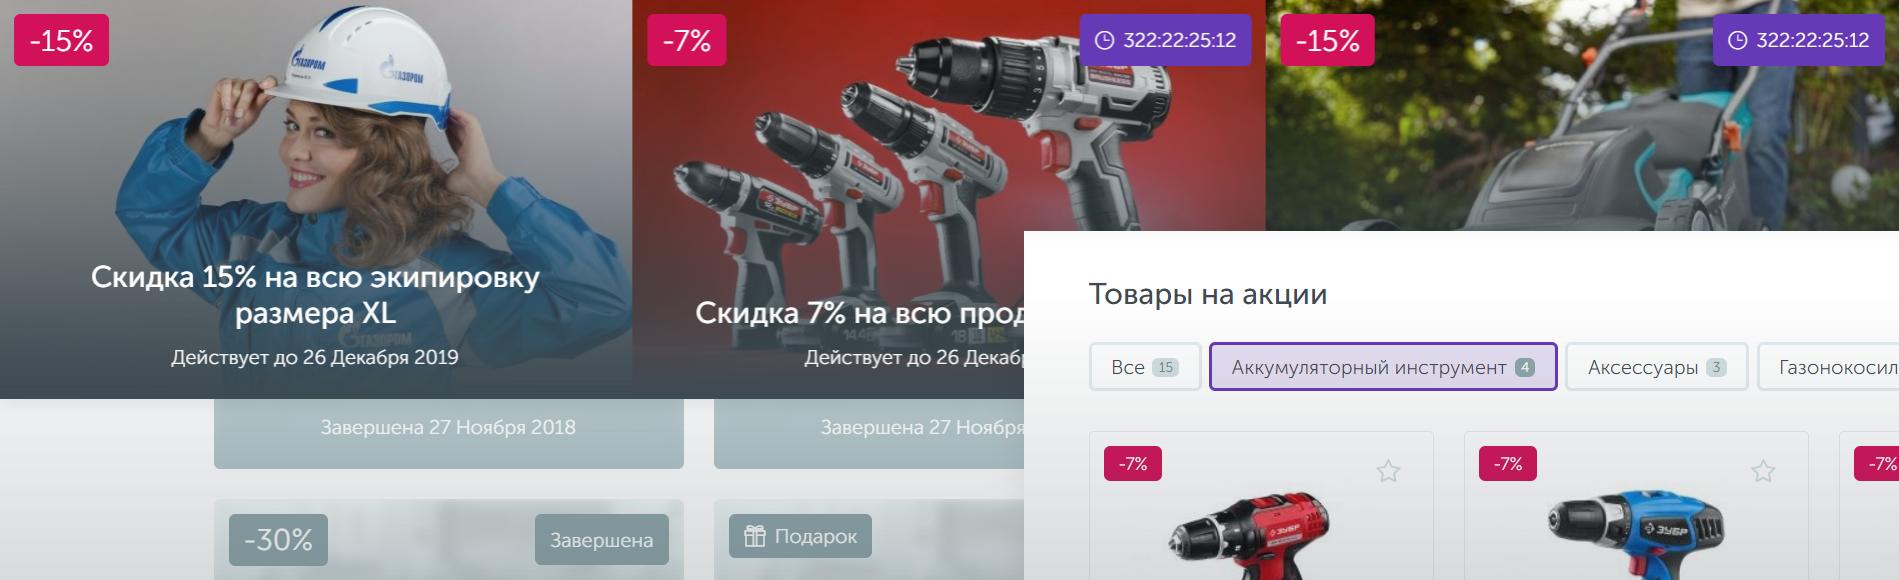 ЭЛЕКТРОСИЛА NEXT - Раздел Акции и скидки 1С-Битрикс